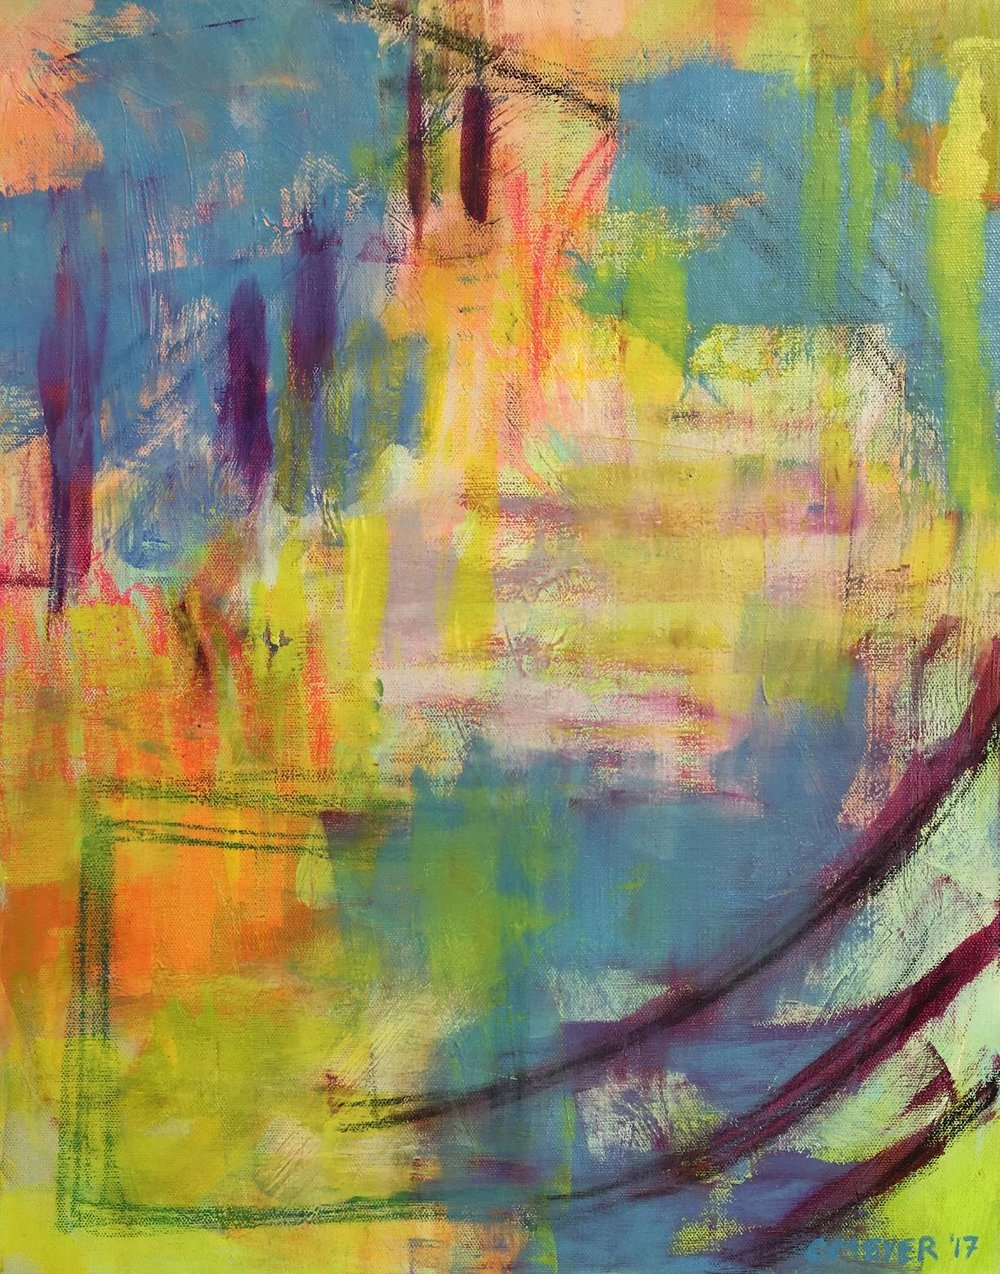 "FLASH OF LIGHT, Chloé Meyer, 16"" x 20"", oil on canvas"